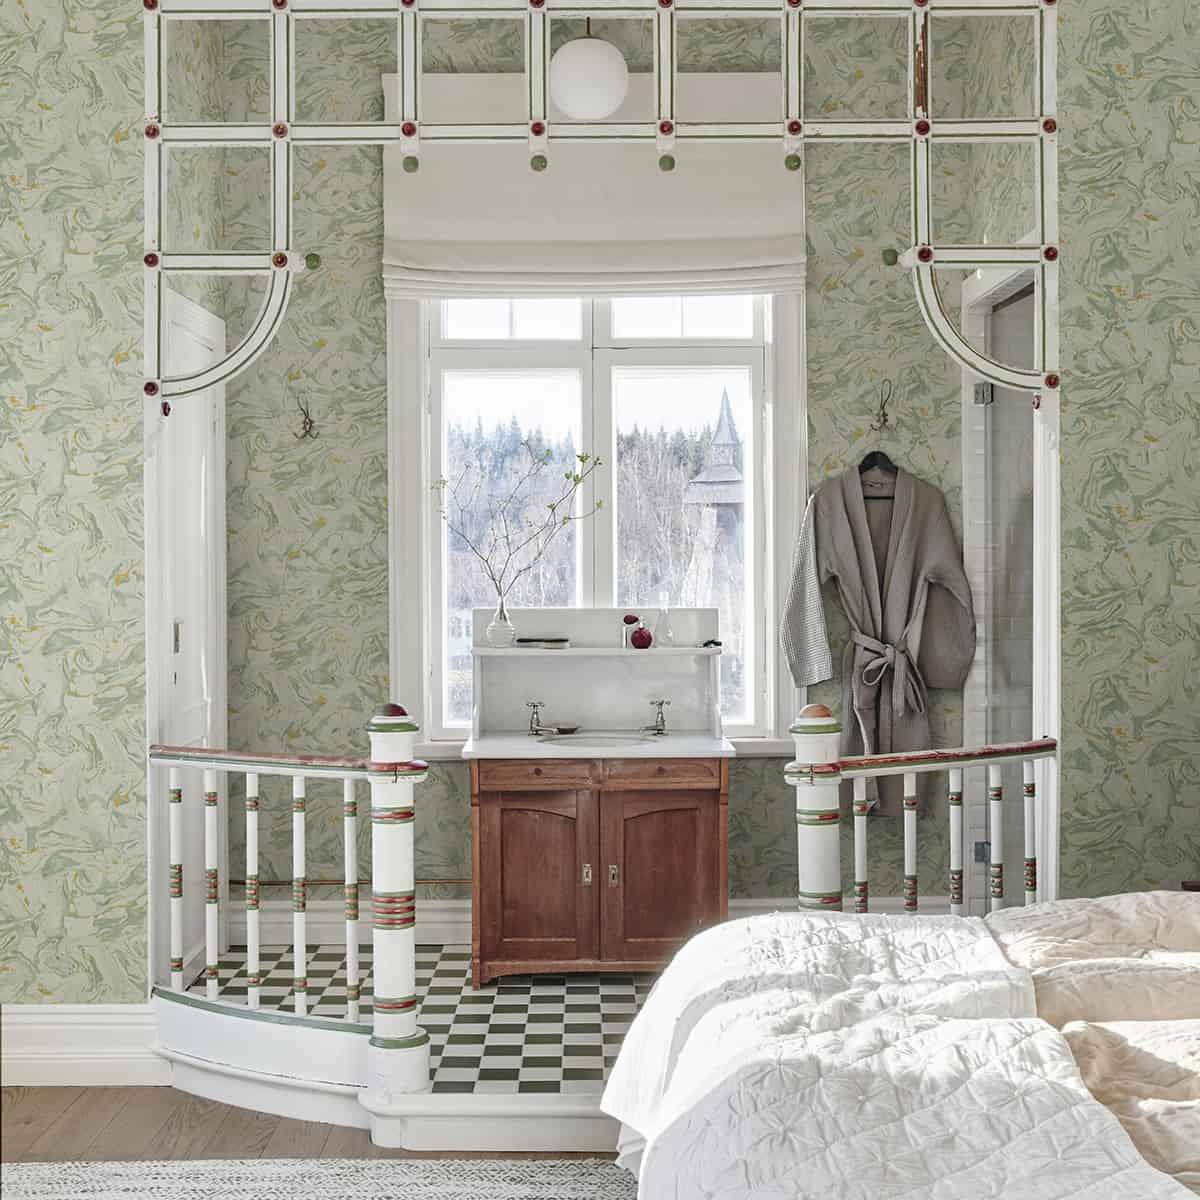 Tapet in stil scandinav, in tonuri de verde pal, intr-un dormitor cu design scandinav, cu baie open space si fereastra